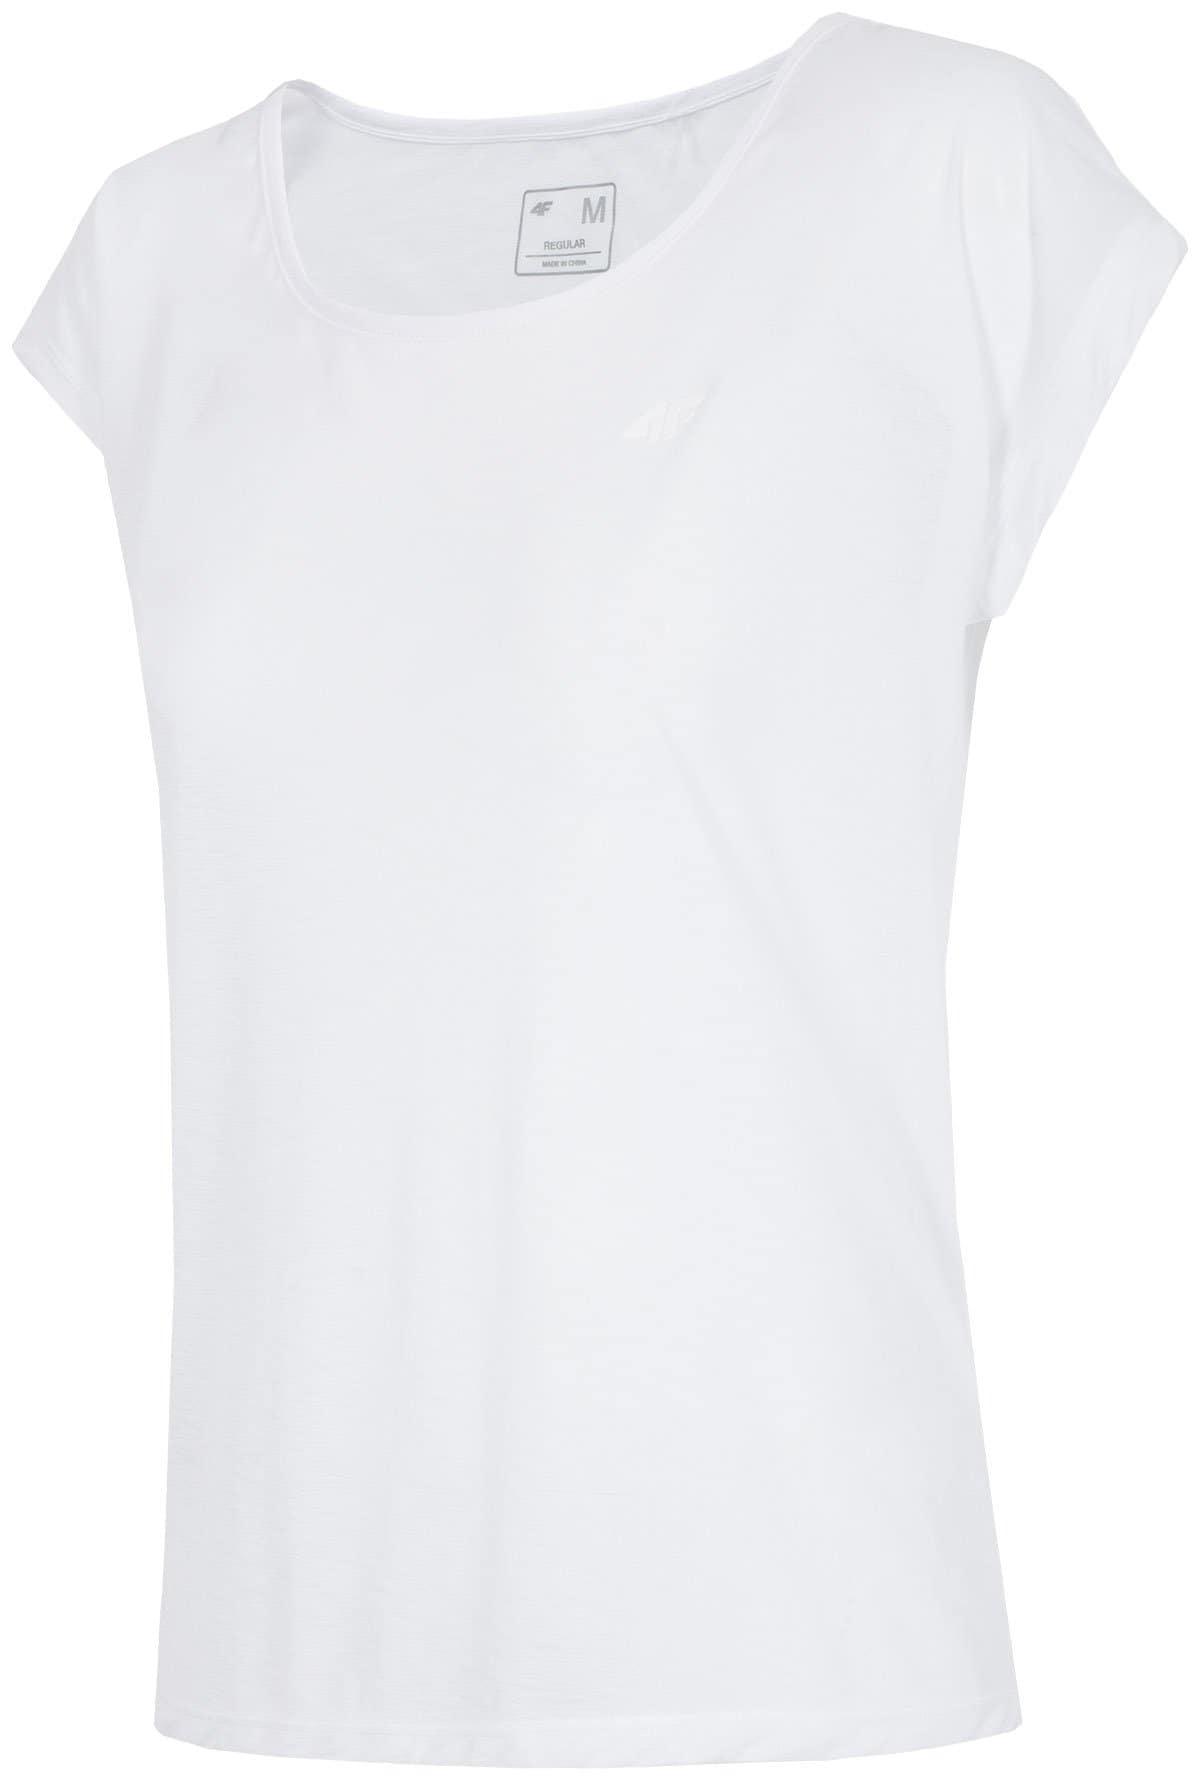 Koszulka treningowa damska TSDF251 - biały